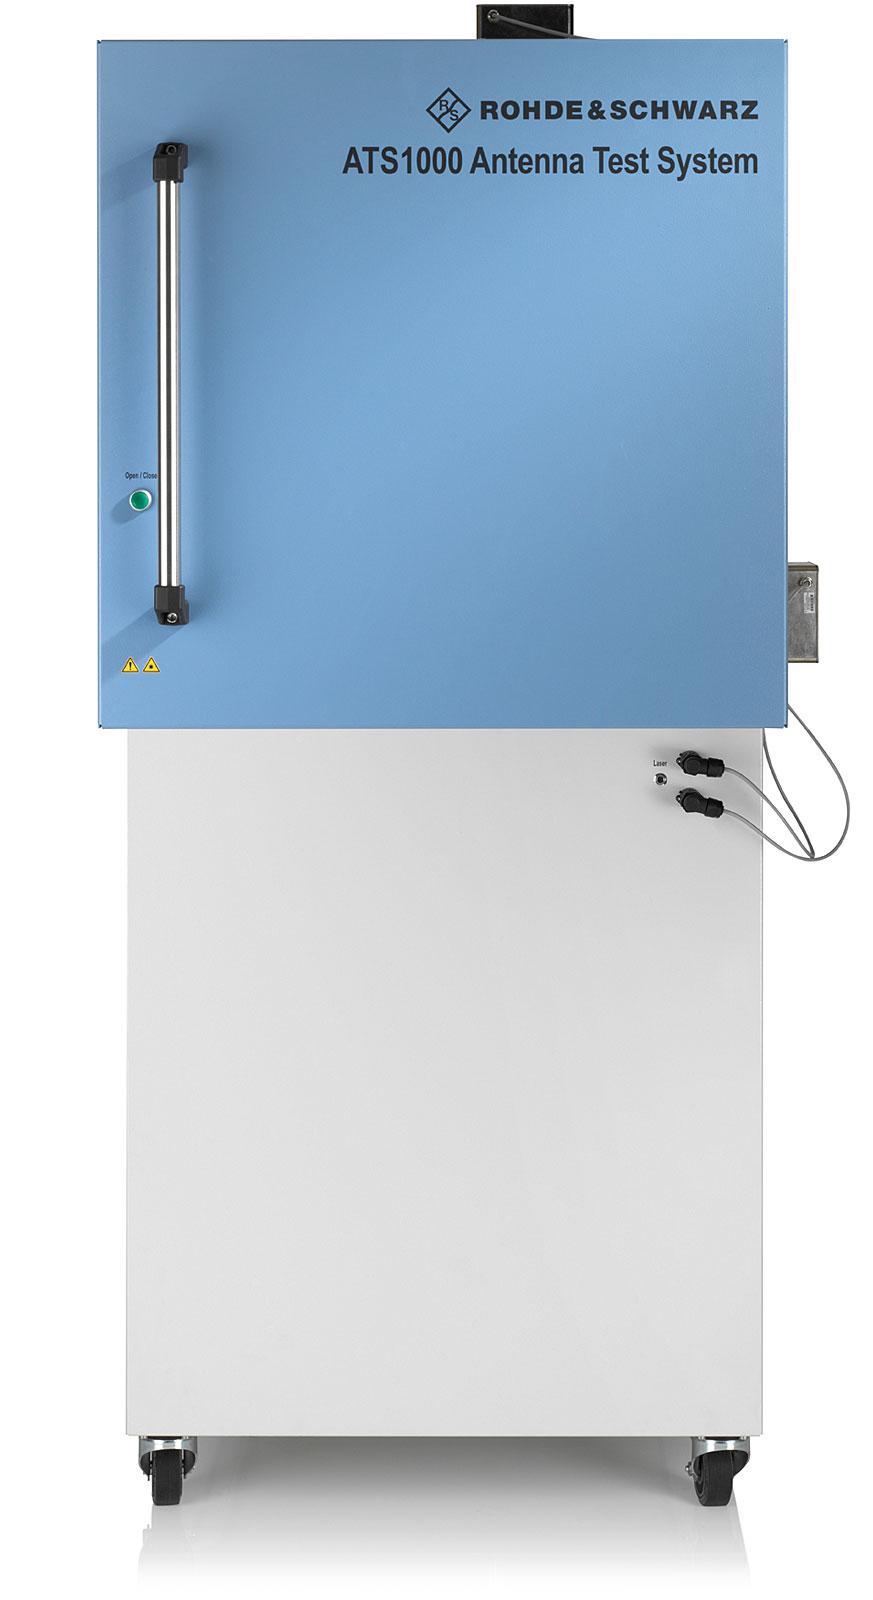 ATS1000-Antenna-Test-System_img01_49071_02.jpg